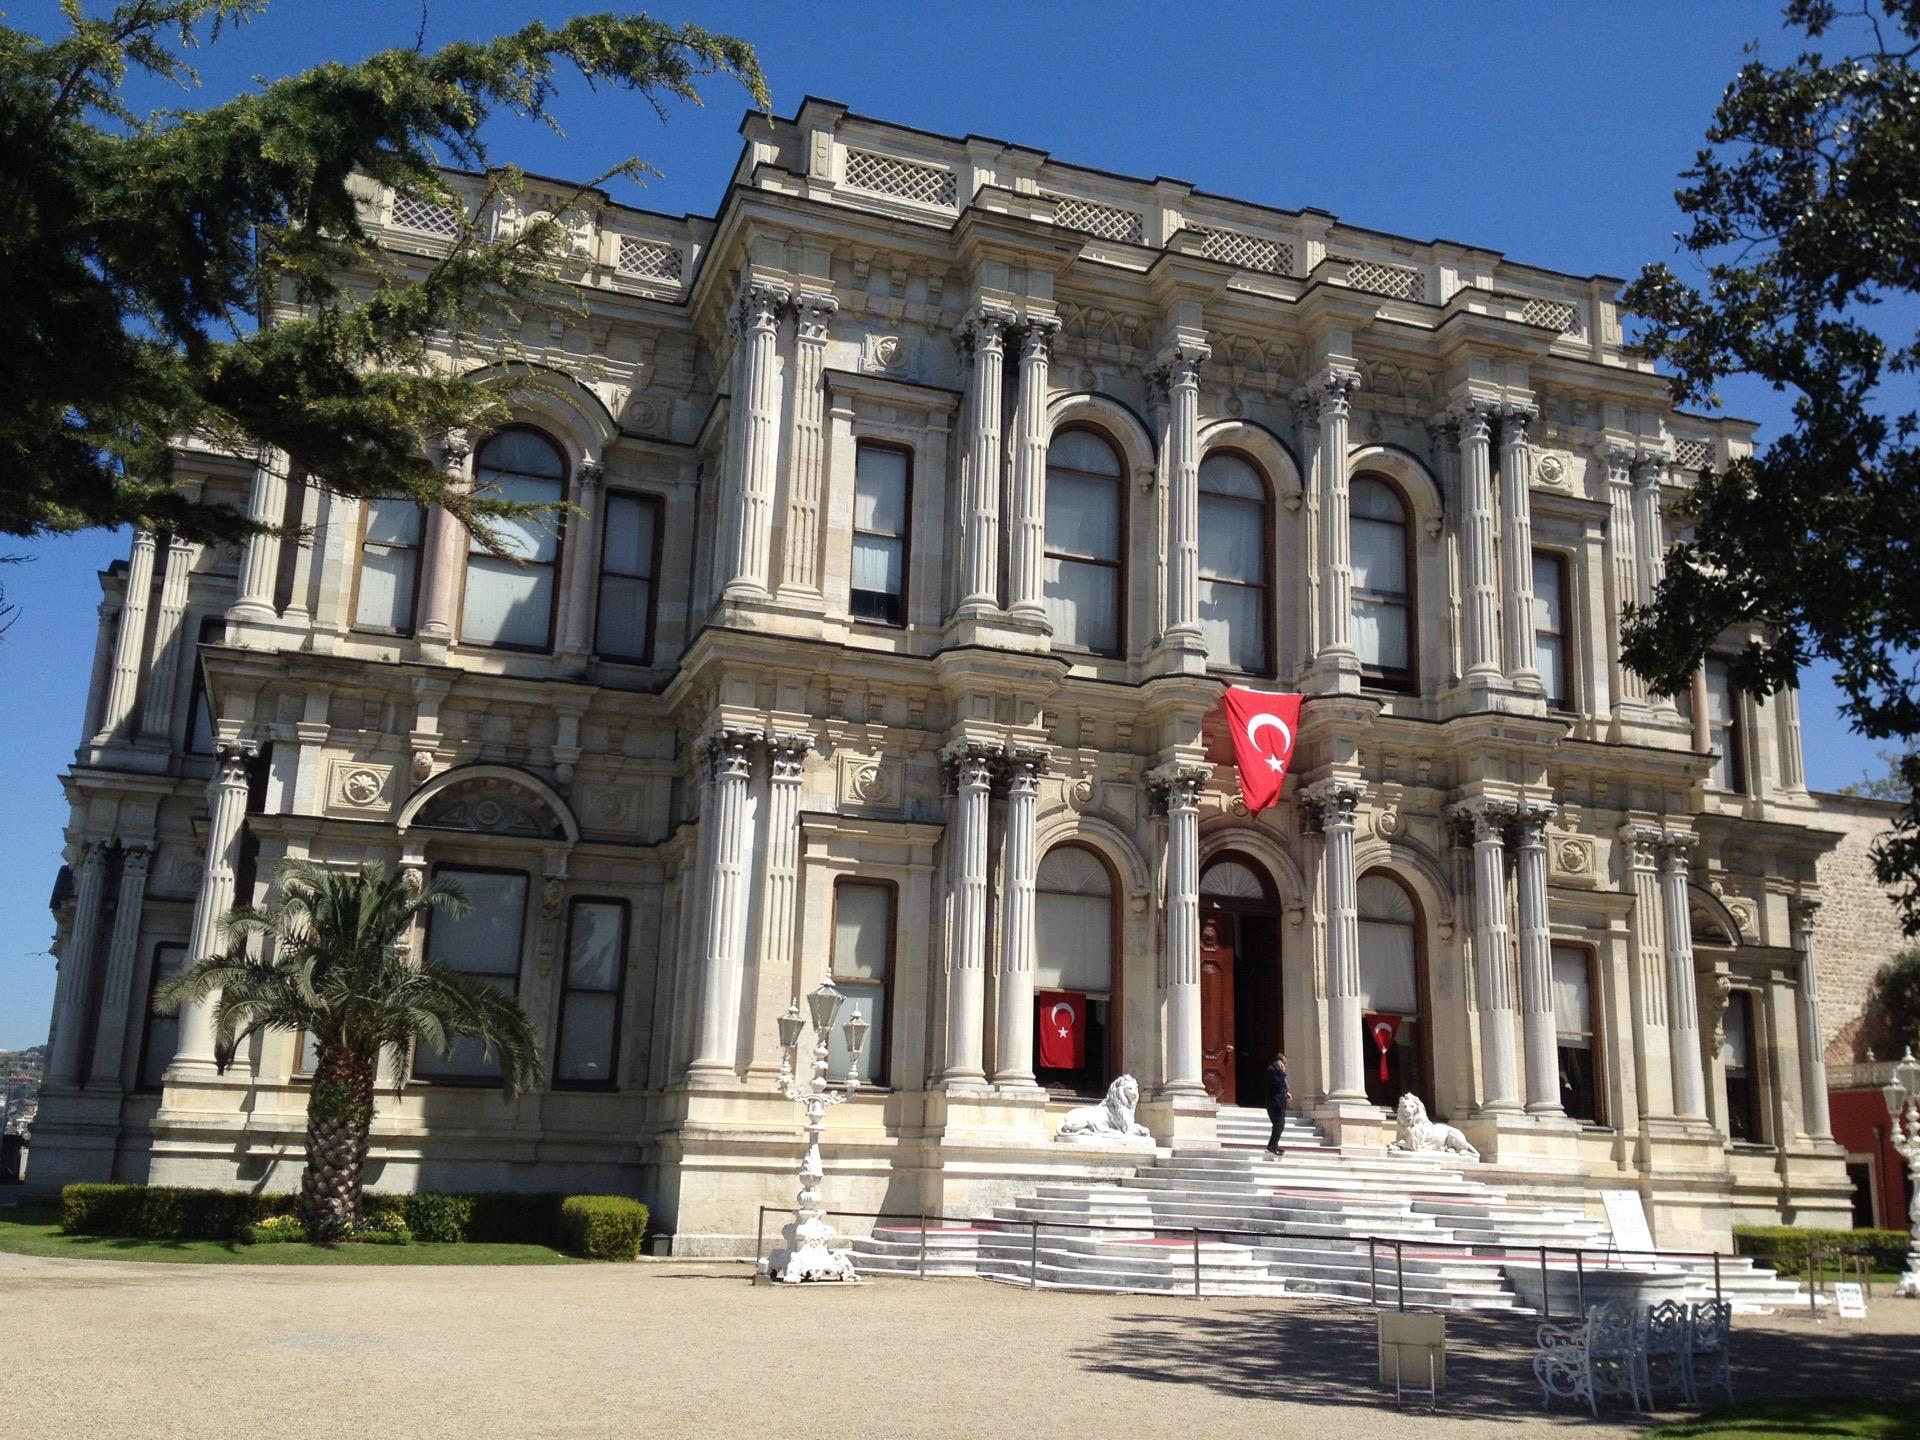 Beylerbeyi Palace